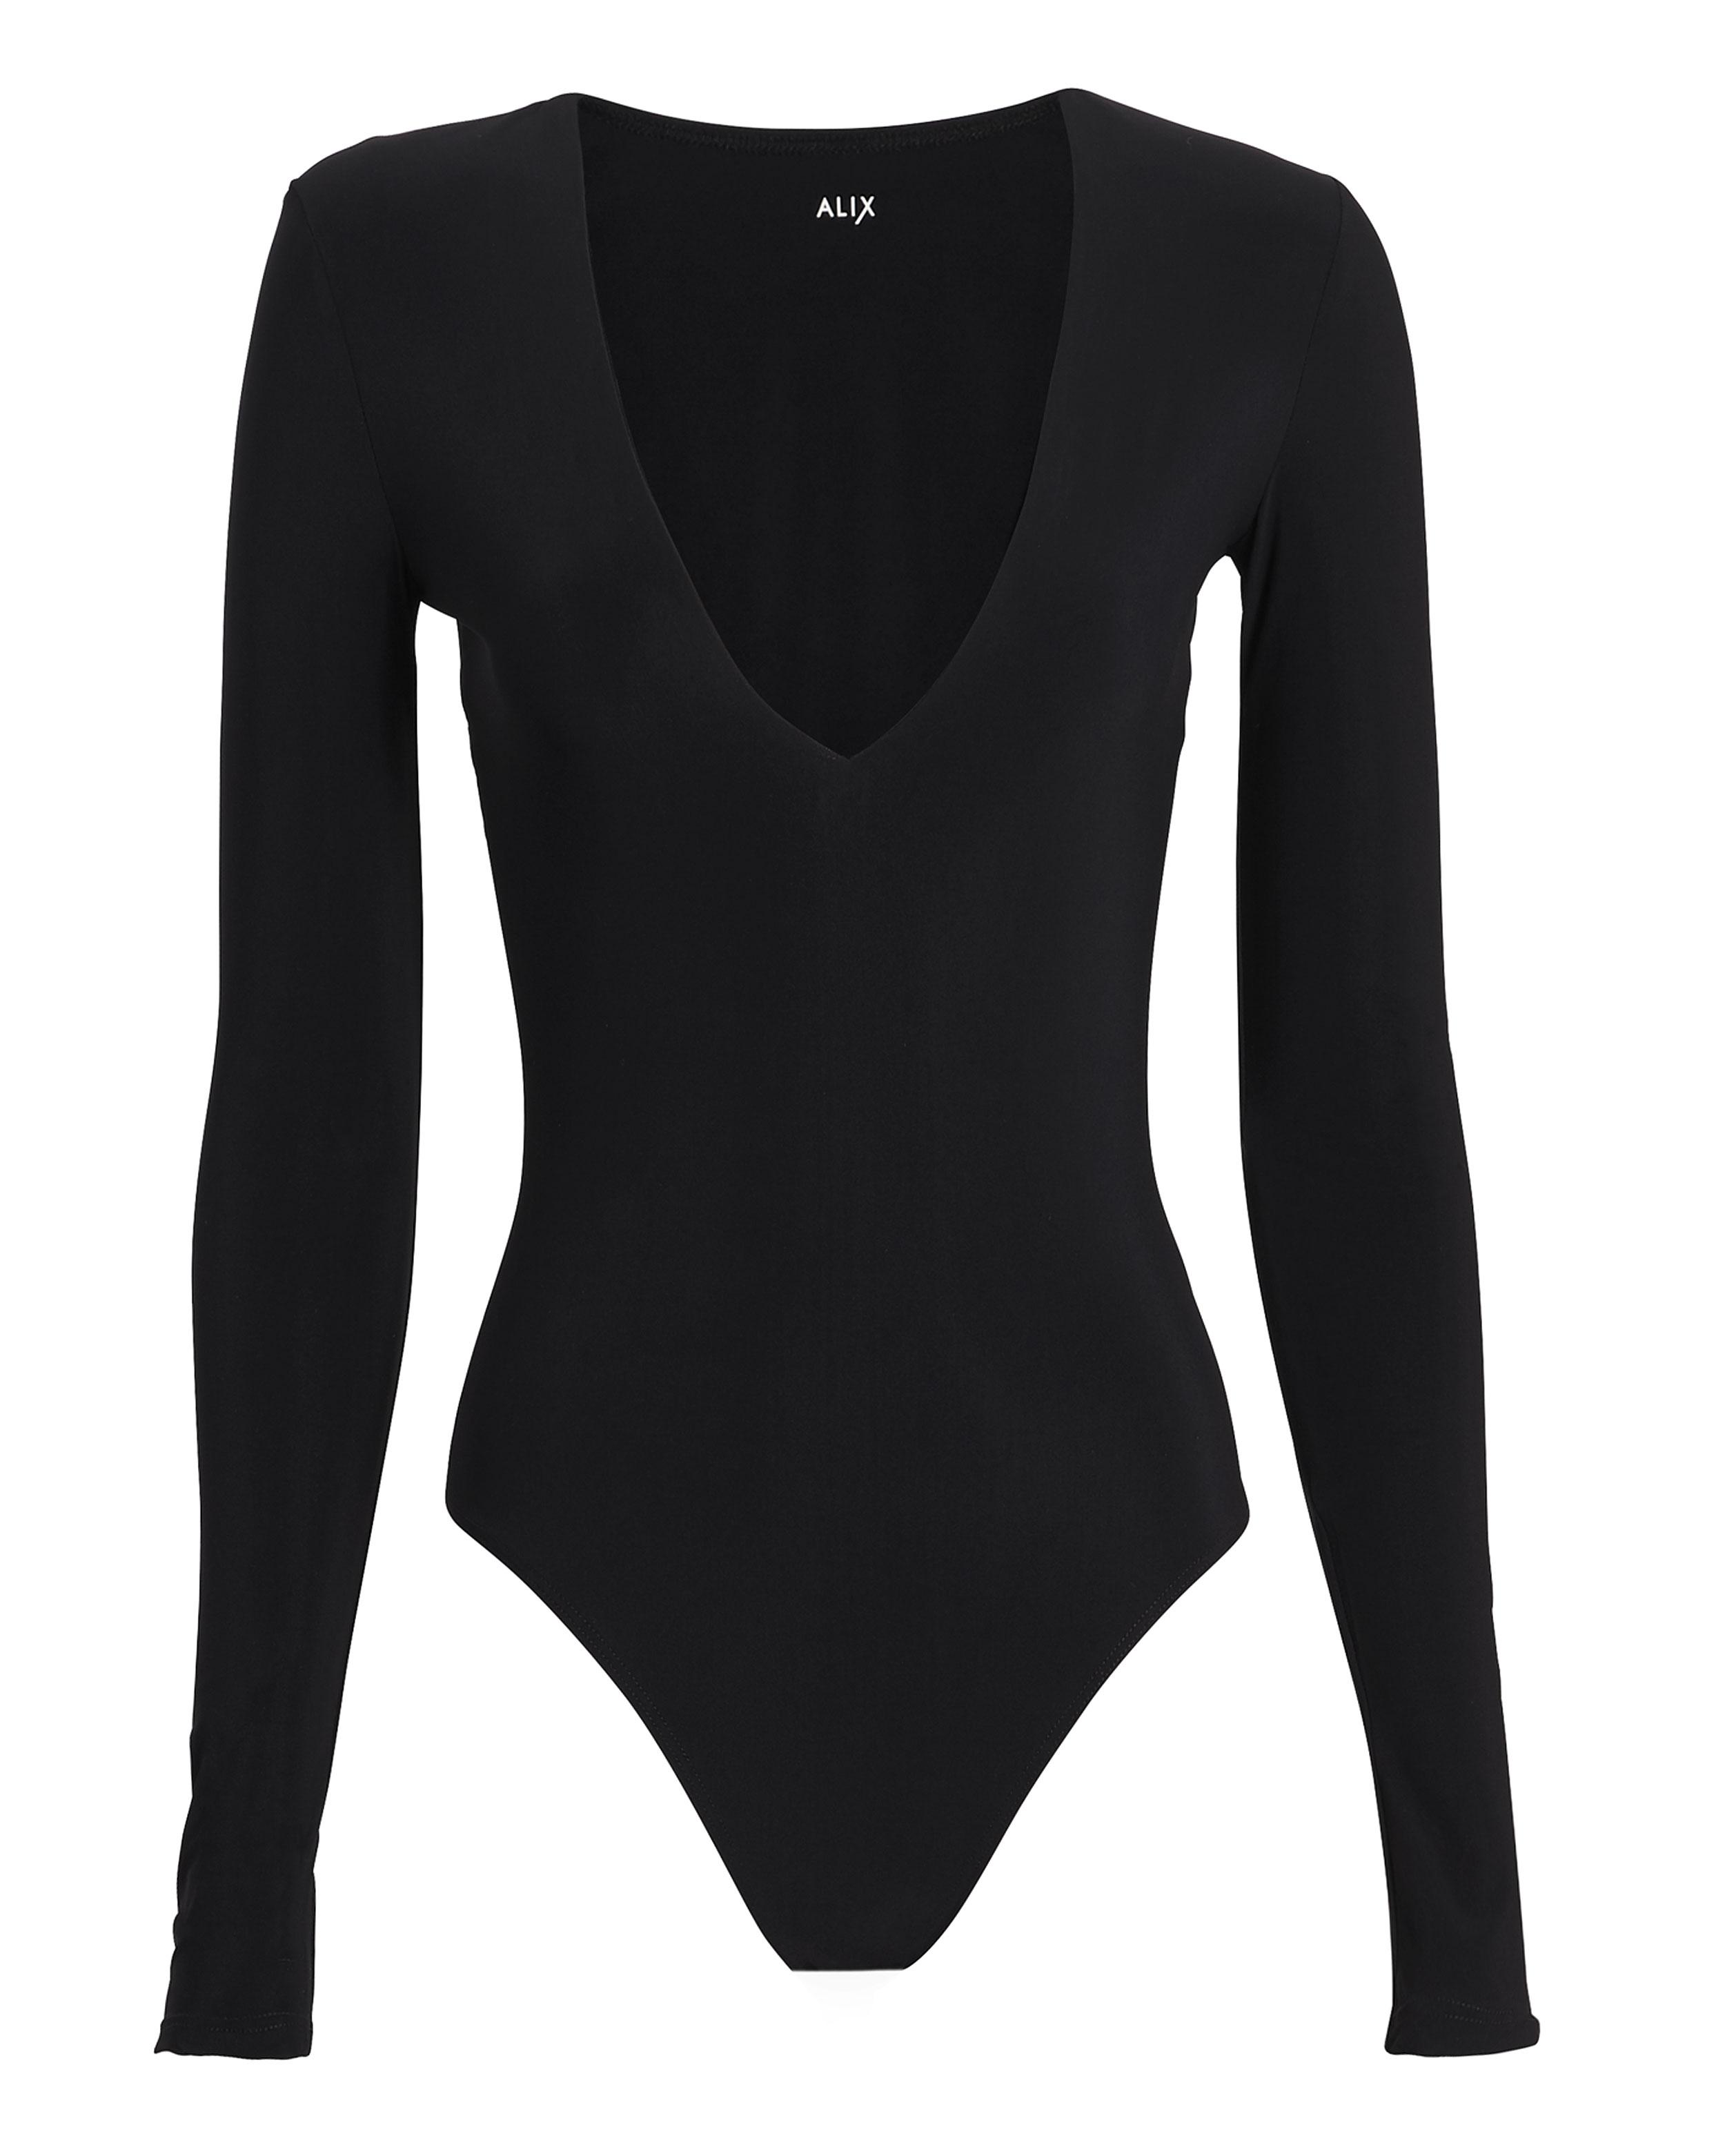 ALIX Irving Black Bodysuit